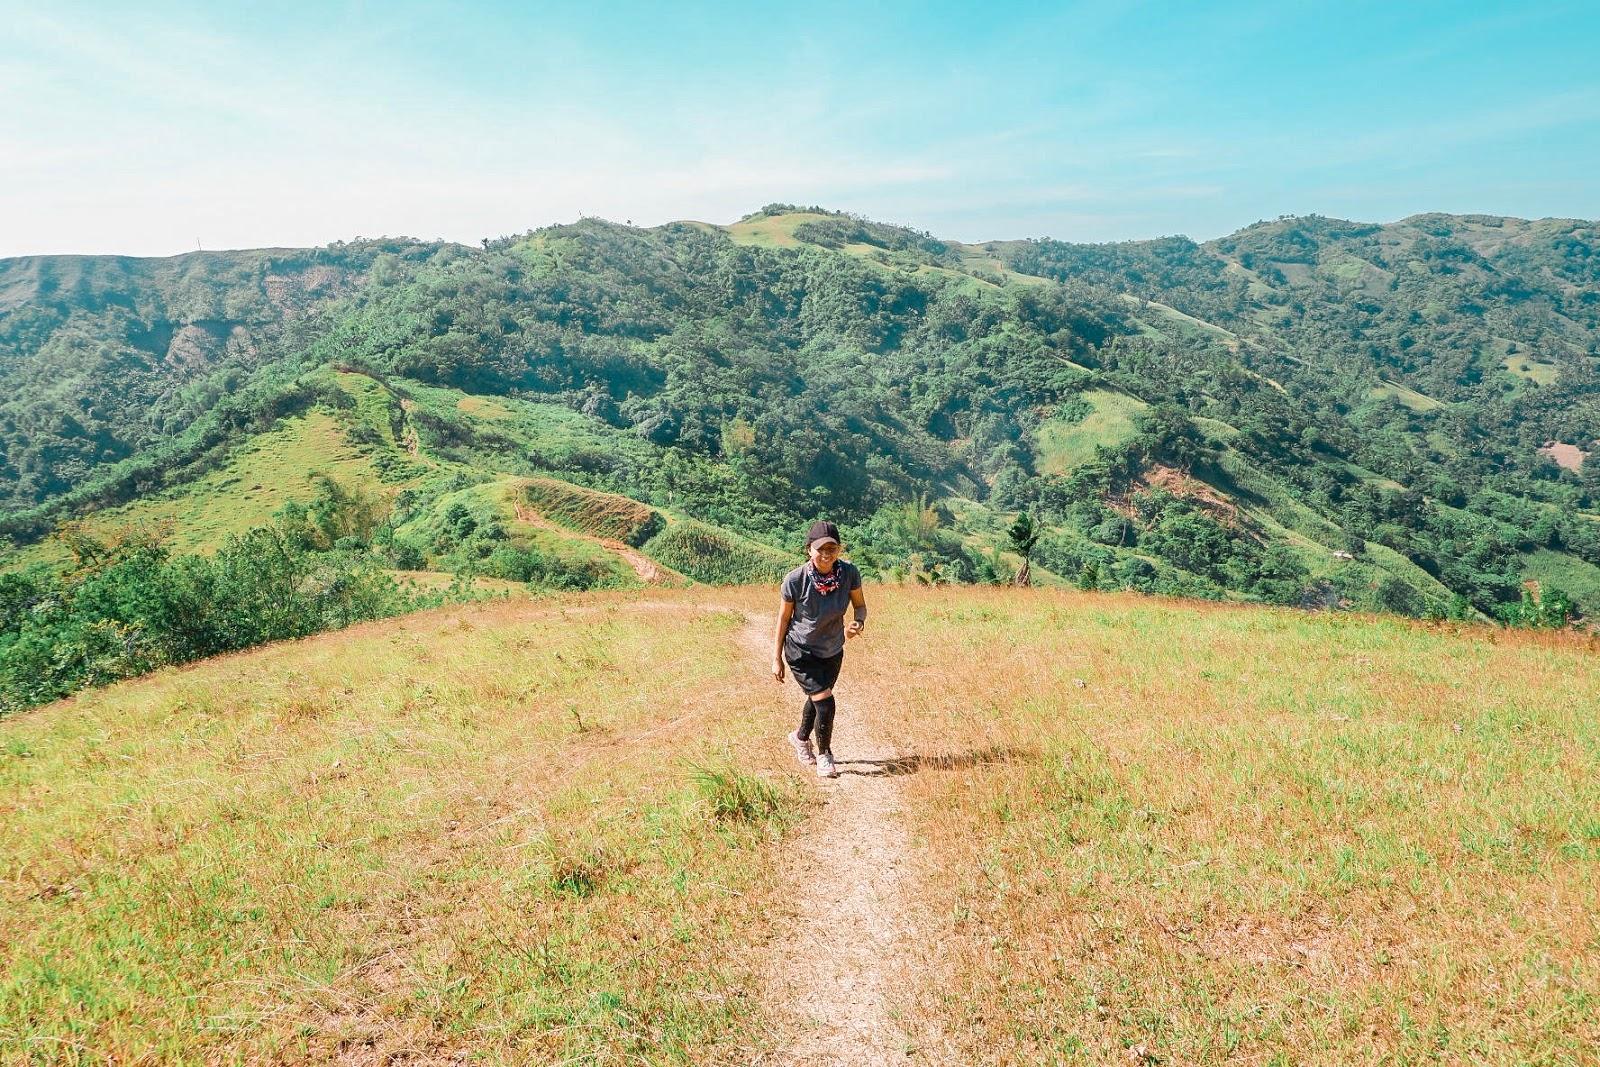 Mt. Mago in Carmen Cebu: The best hike for me so far